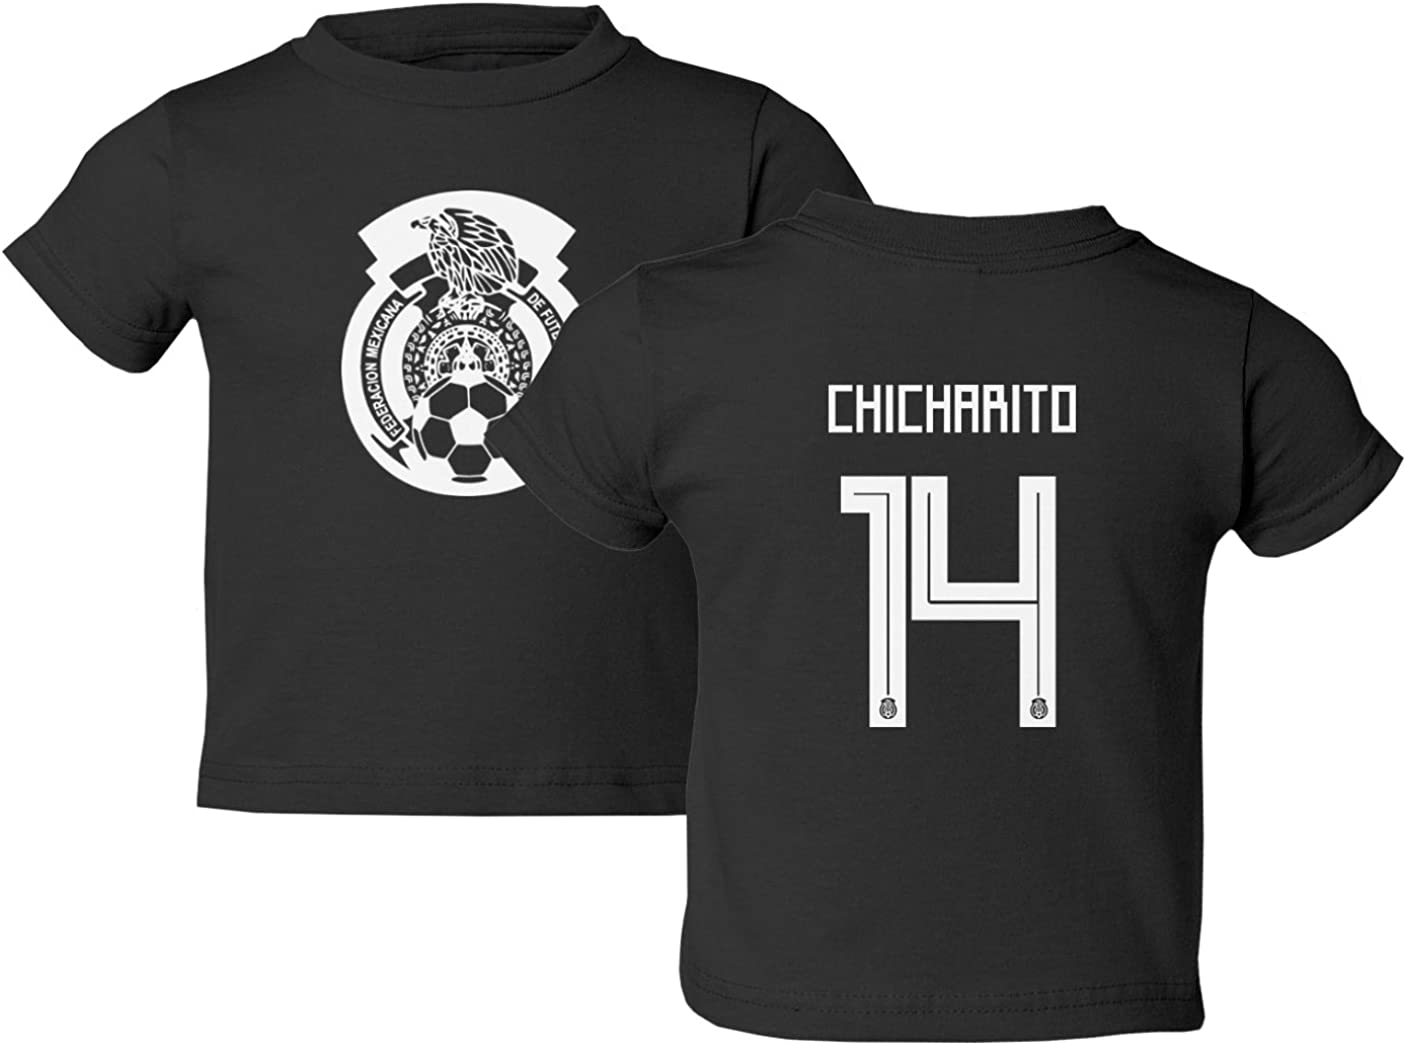 Tcamp Mexico 2018 National Soccer #14 Javier CHICHARITO World Championship Little Kids Girls Boys Toddler T-Shirt Black, 4T